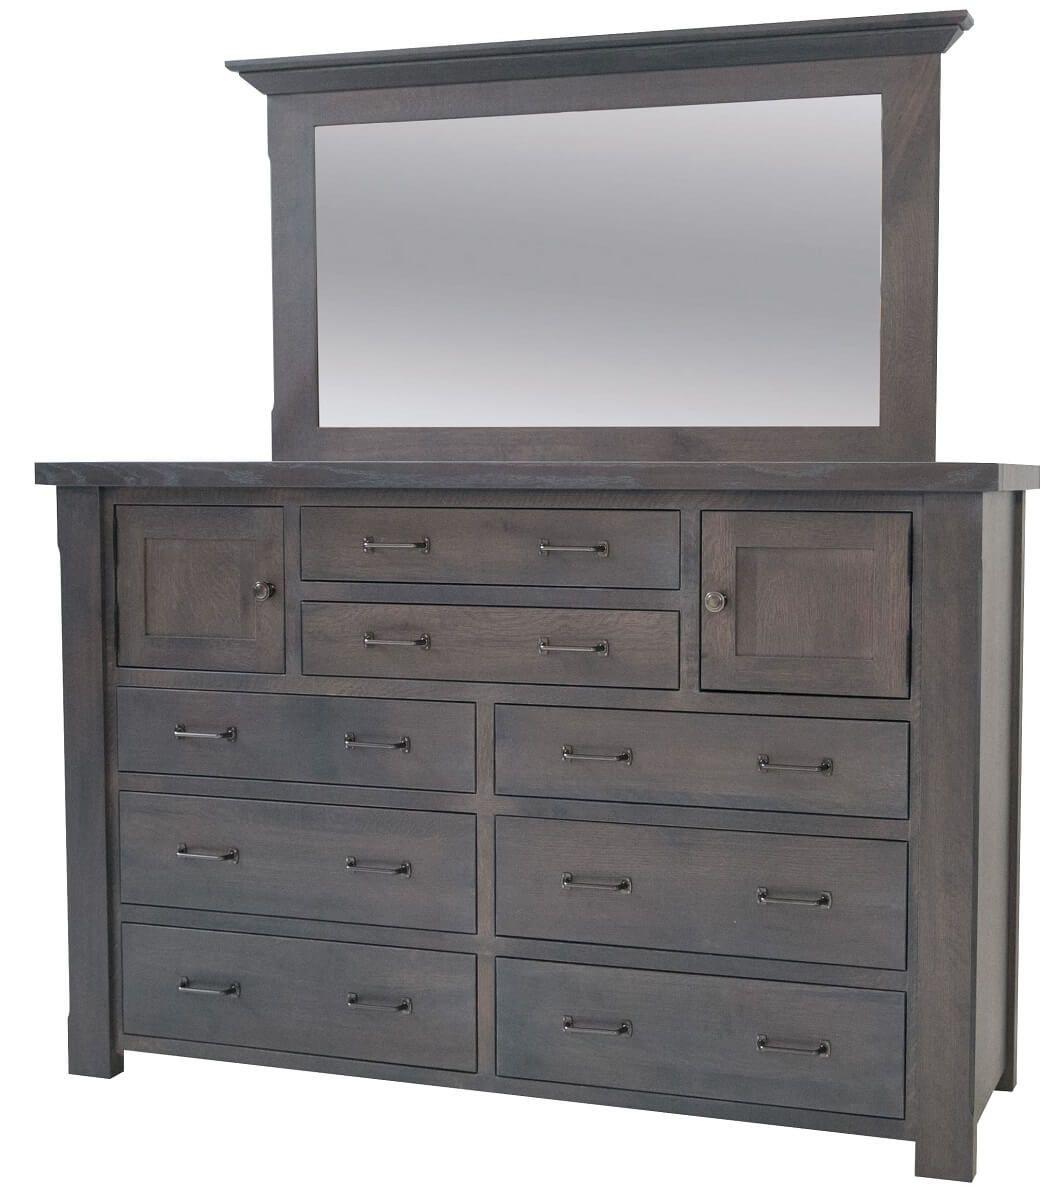 Contemporary Bedroom Dresser